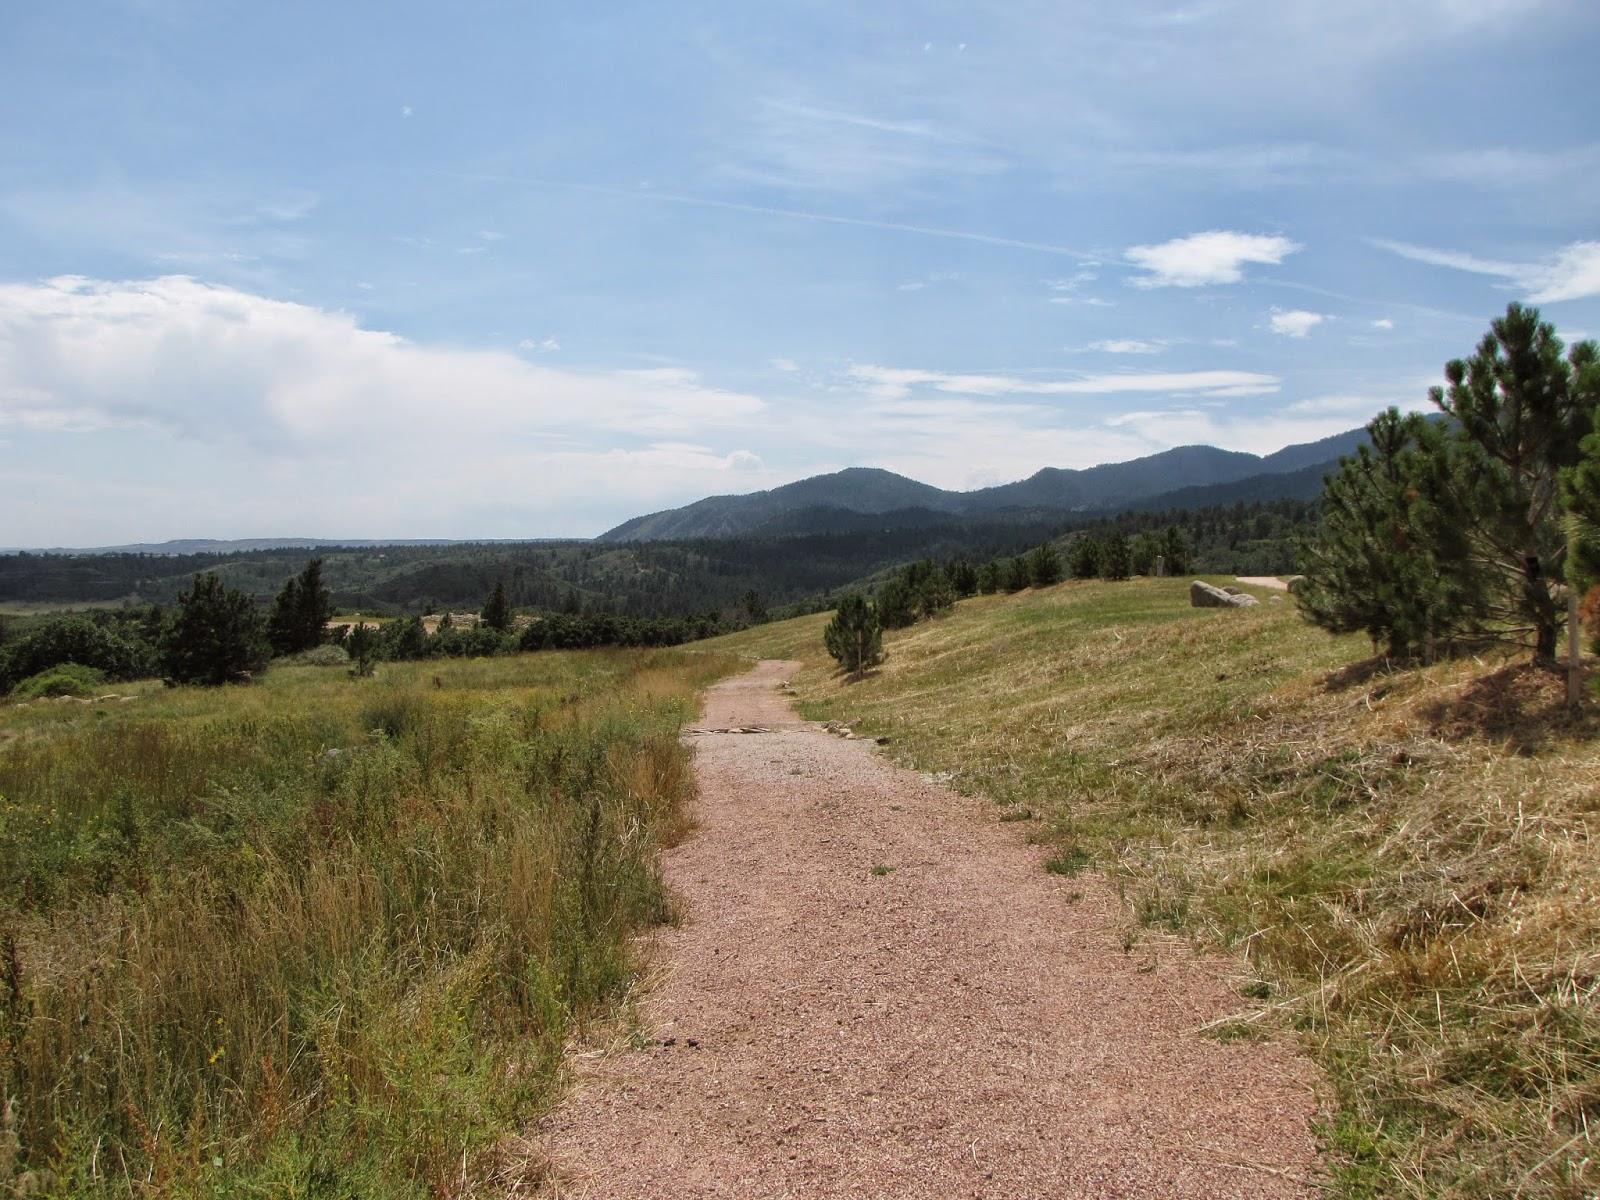 Go Hike Colorado: Cheyenne Mountain State Park - Blackmer Loop